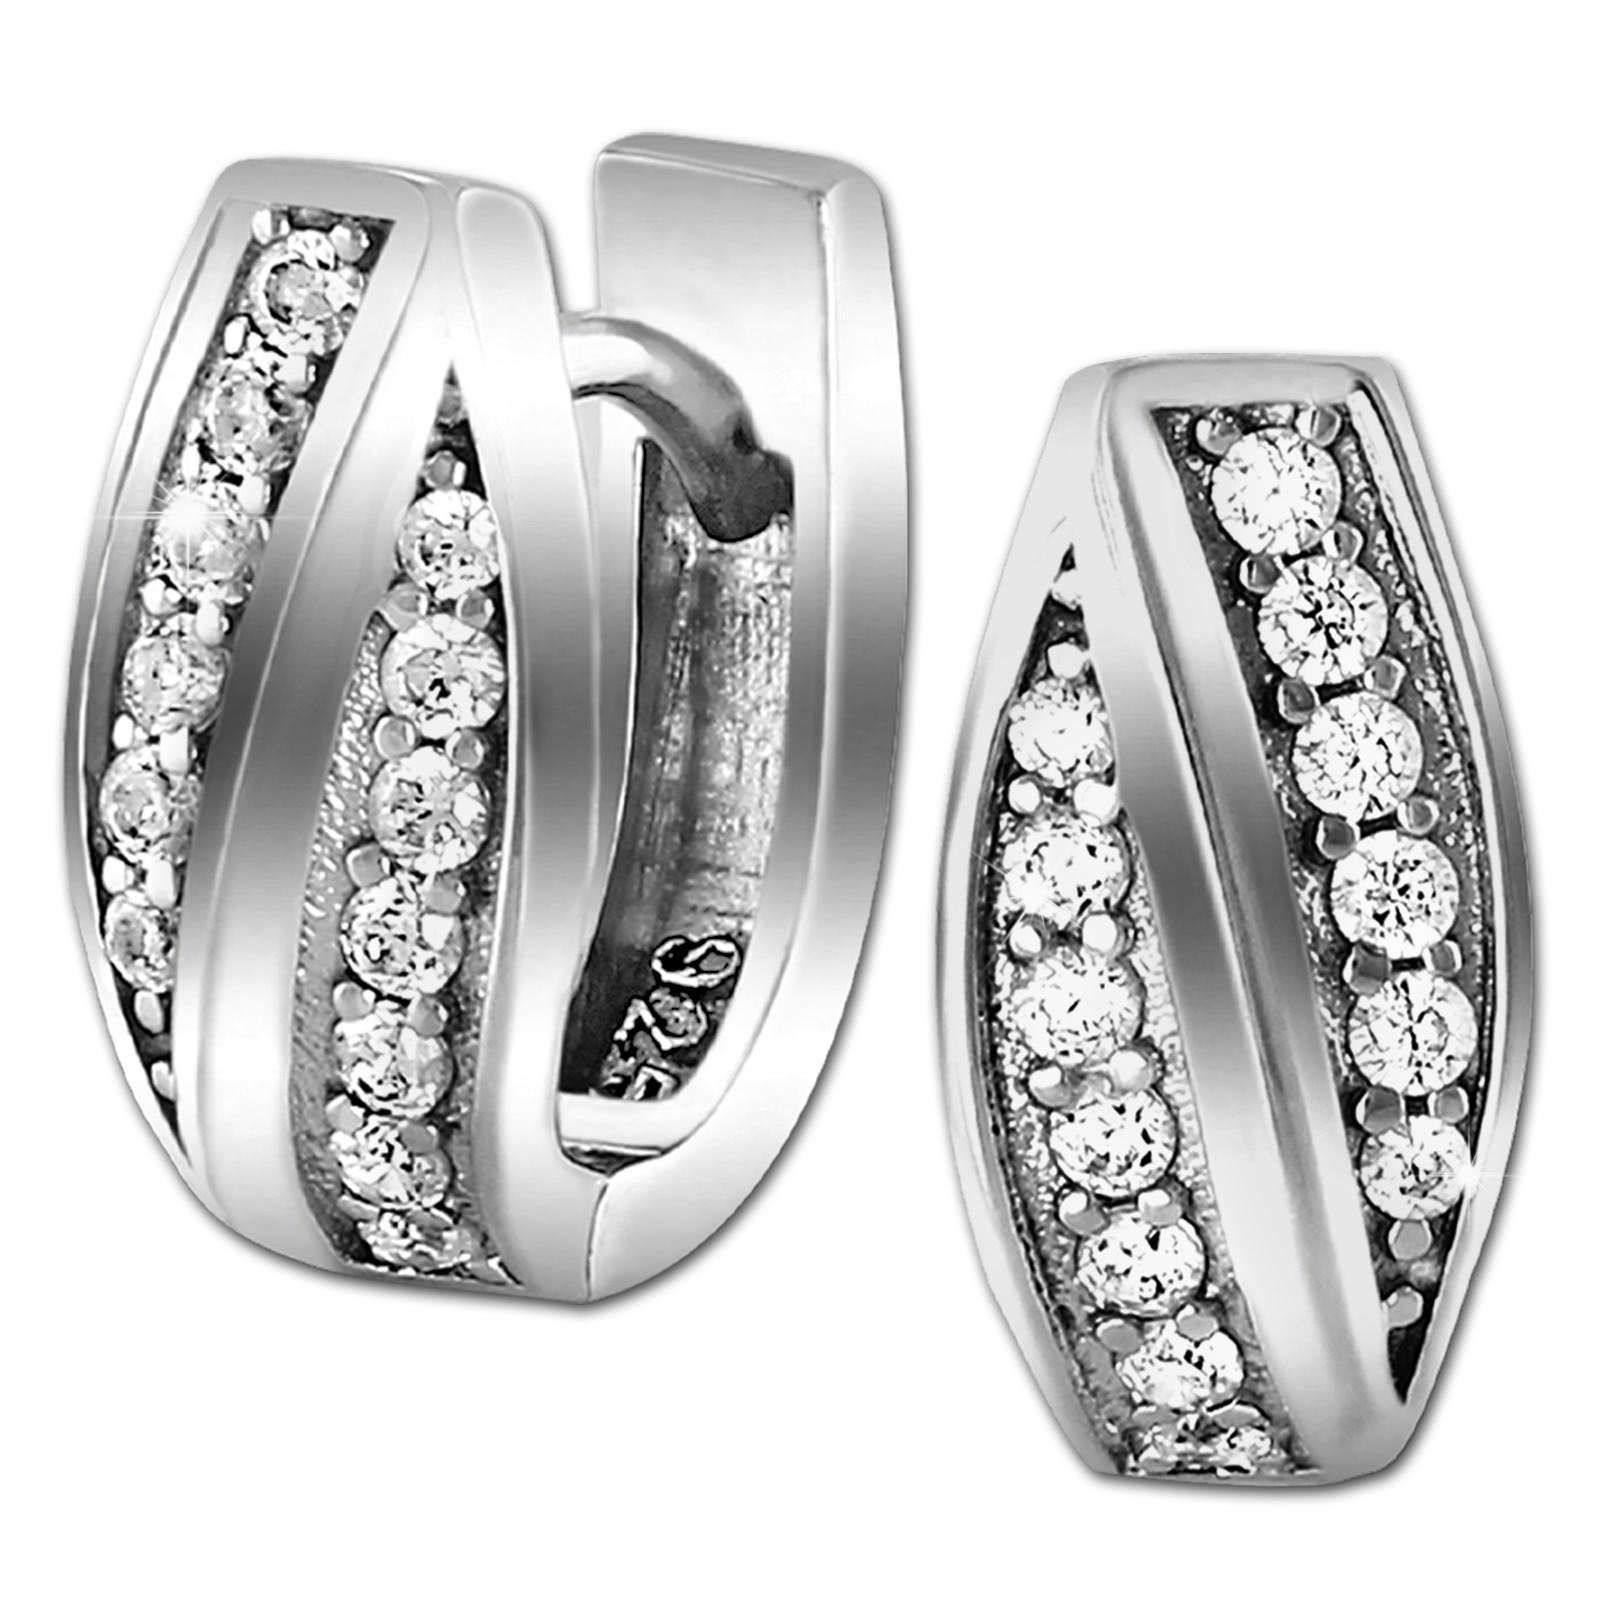 SilberDream Creole Senses Zirkonia weiß 925 Sterling Silber Damen SDO4323W